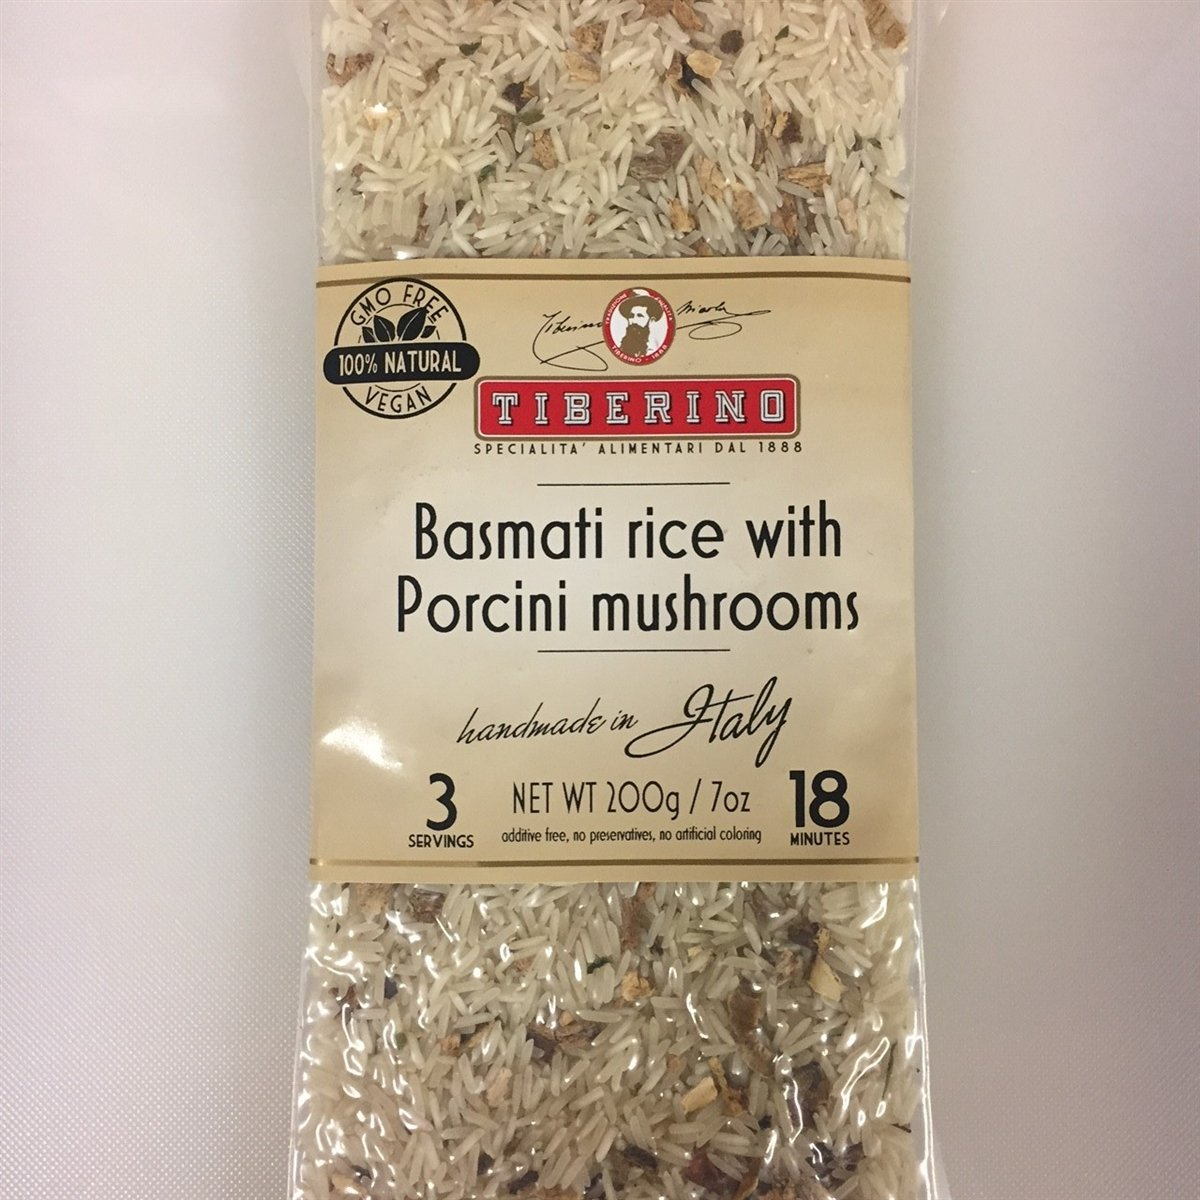 Tiberino's Real Italian Meals - Basmati Rice with Porcini Mushroom